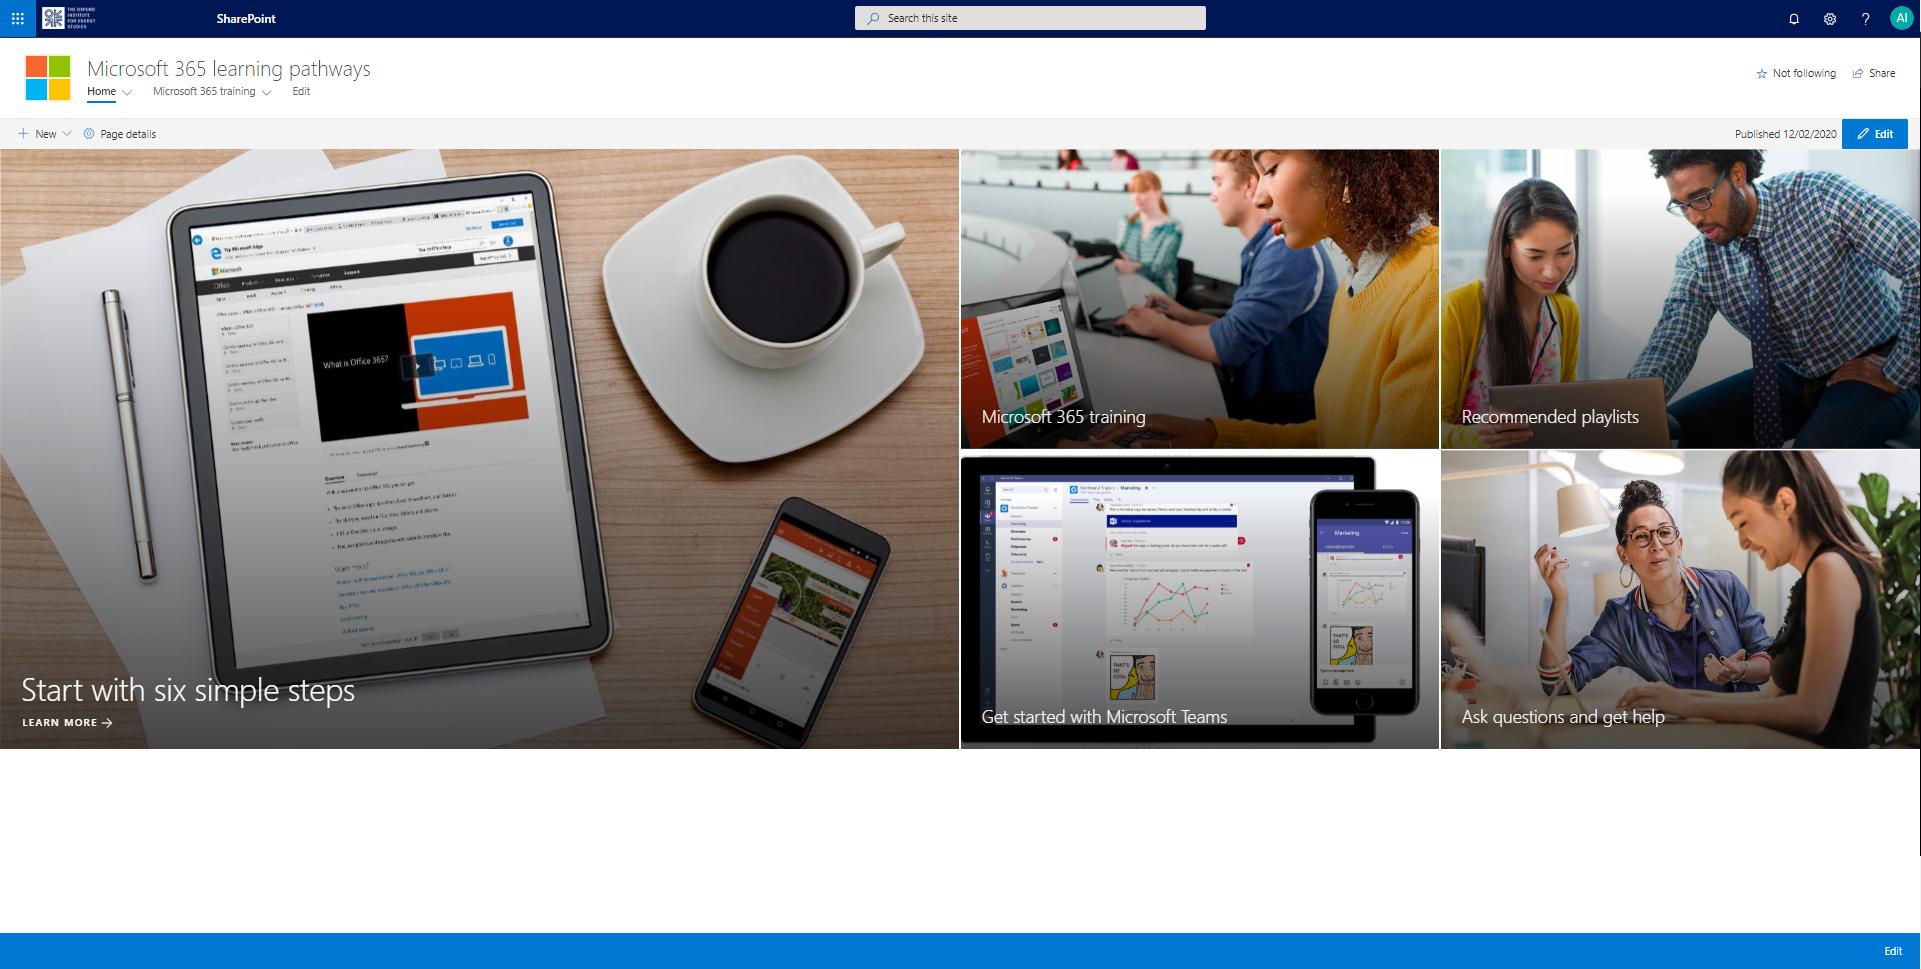 Microsoft Learning Pathways